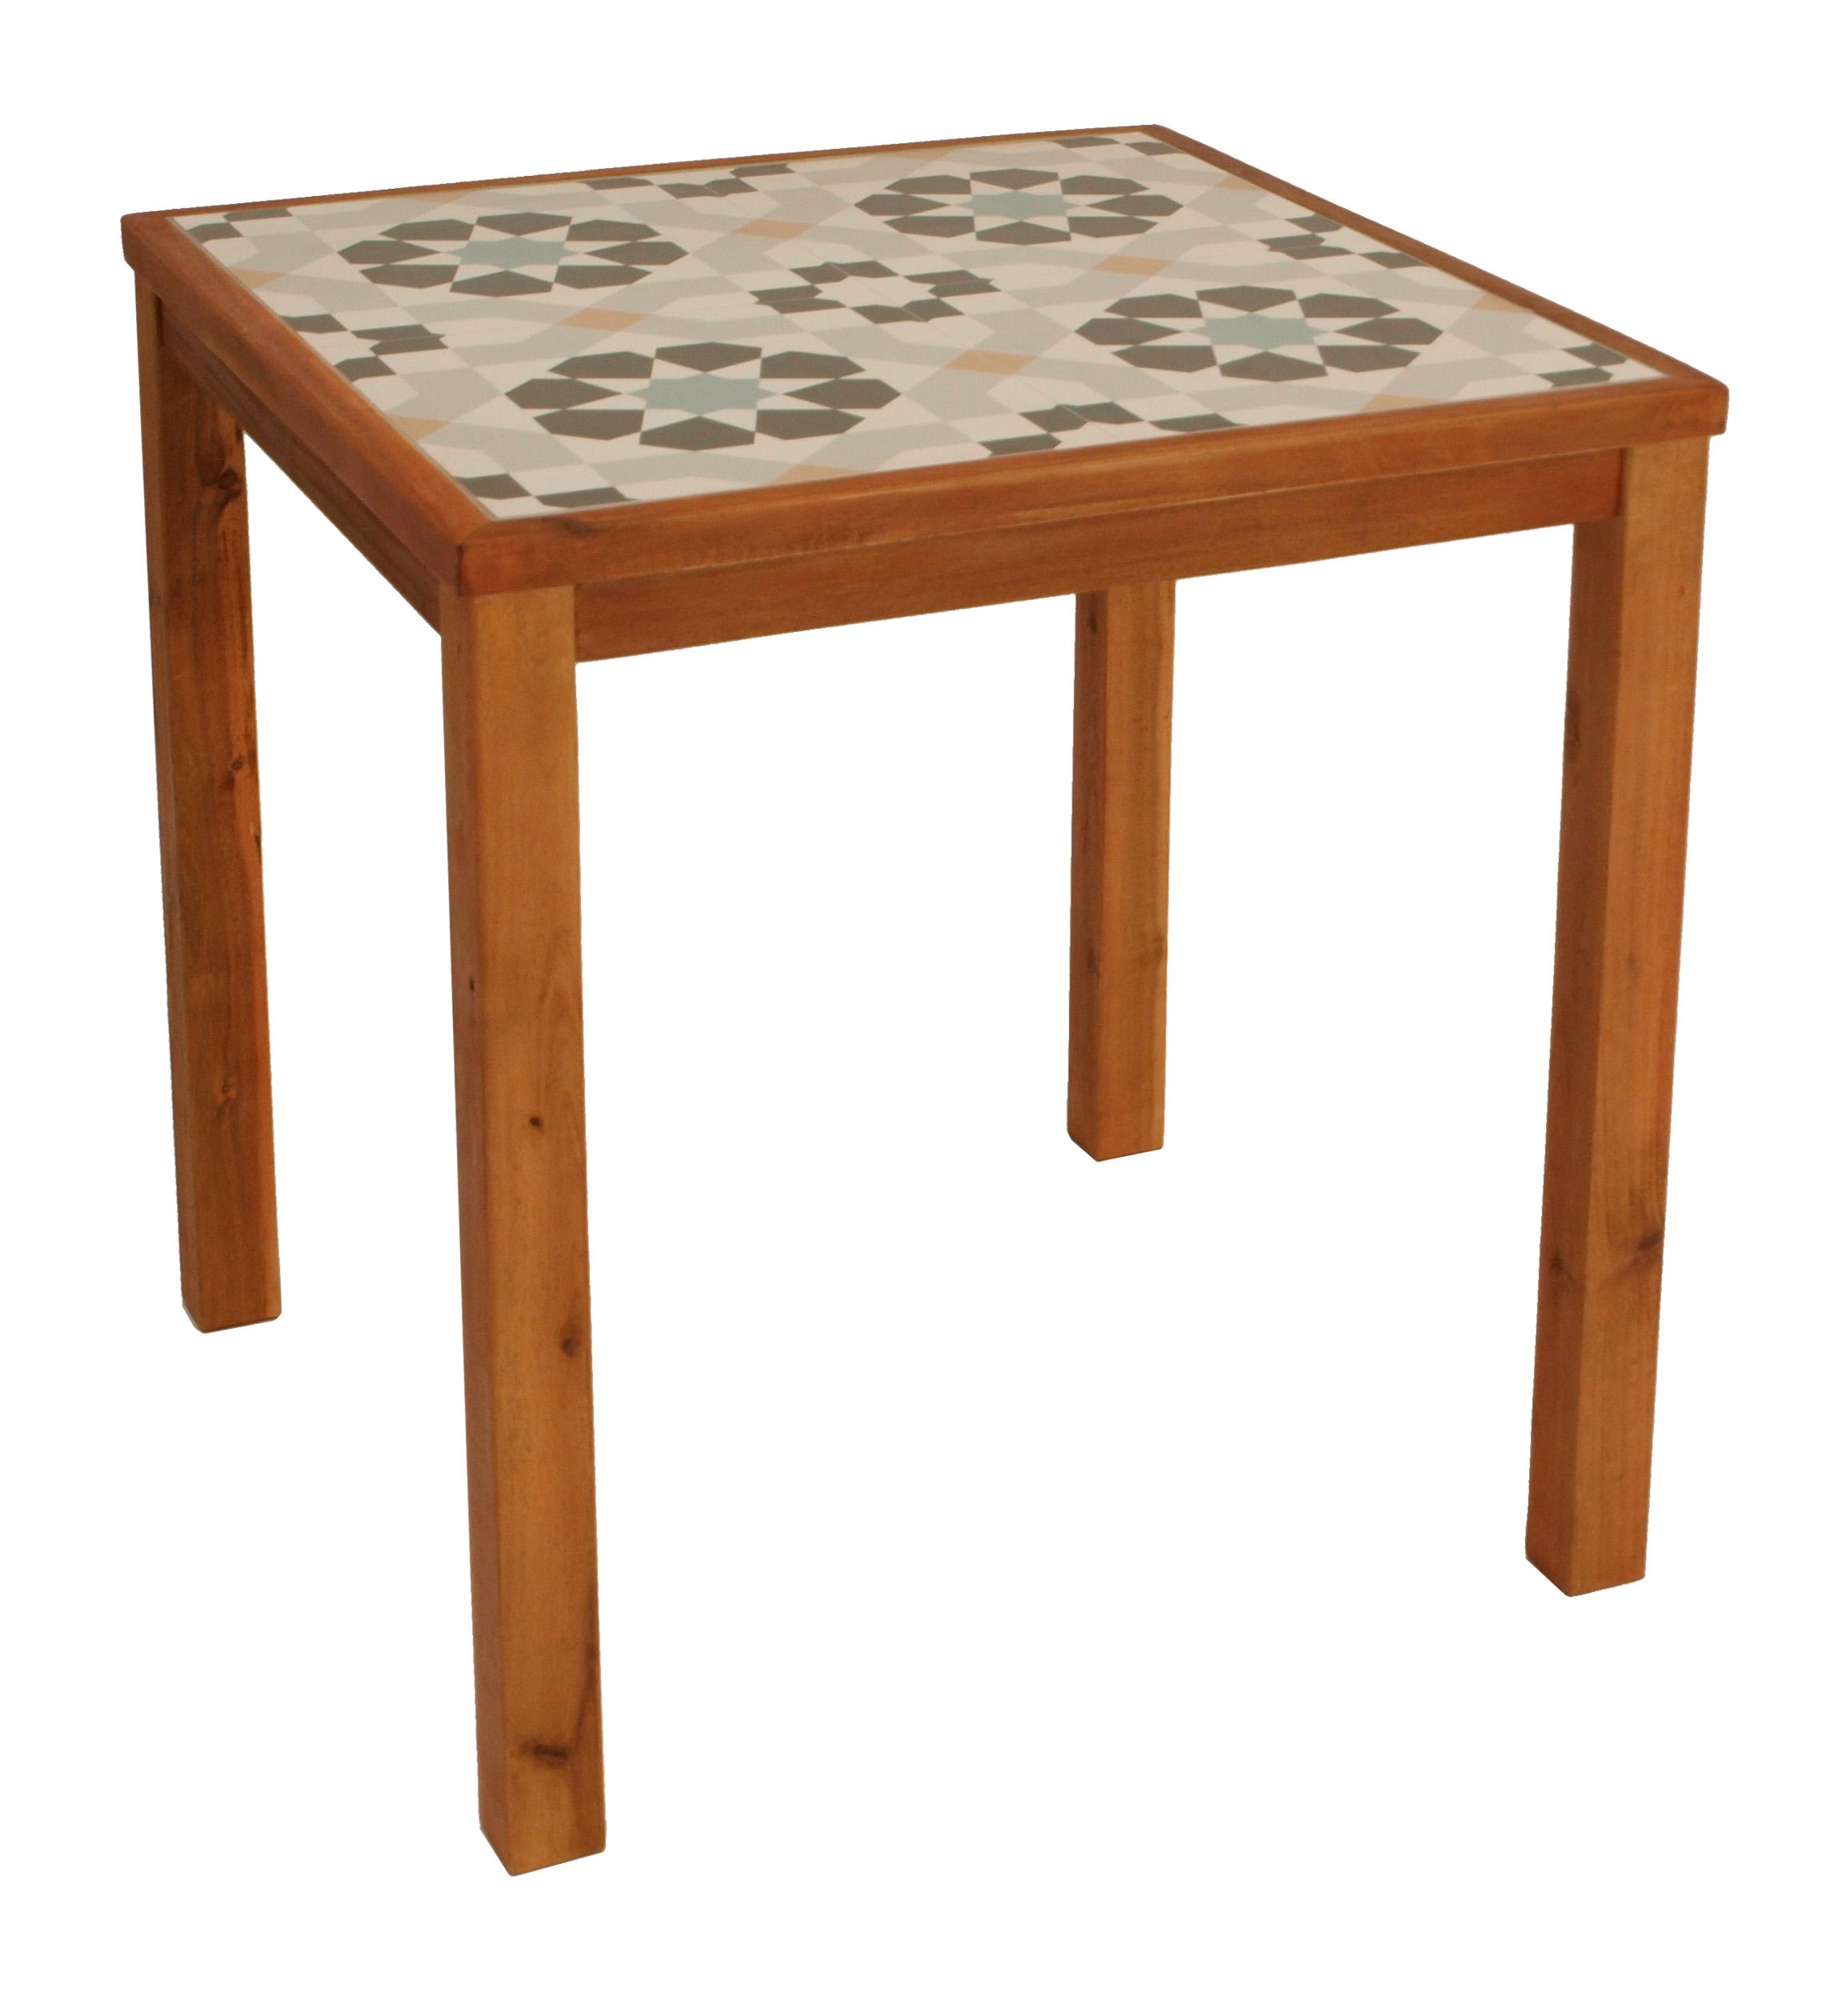 Tisch SANTA CLARA 65x65cm, Tischplatte Keramik, Gestell Eukalyptus, FSC®-zertif.